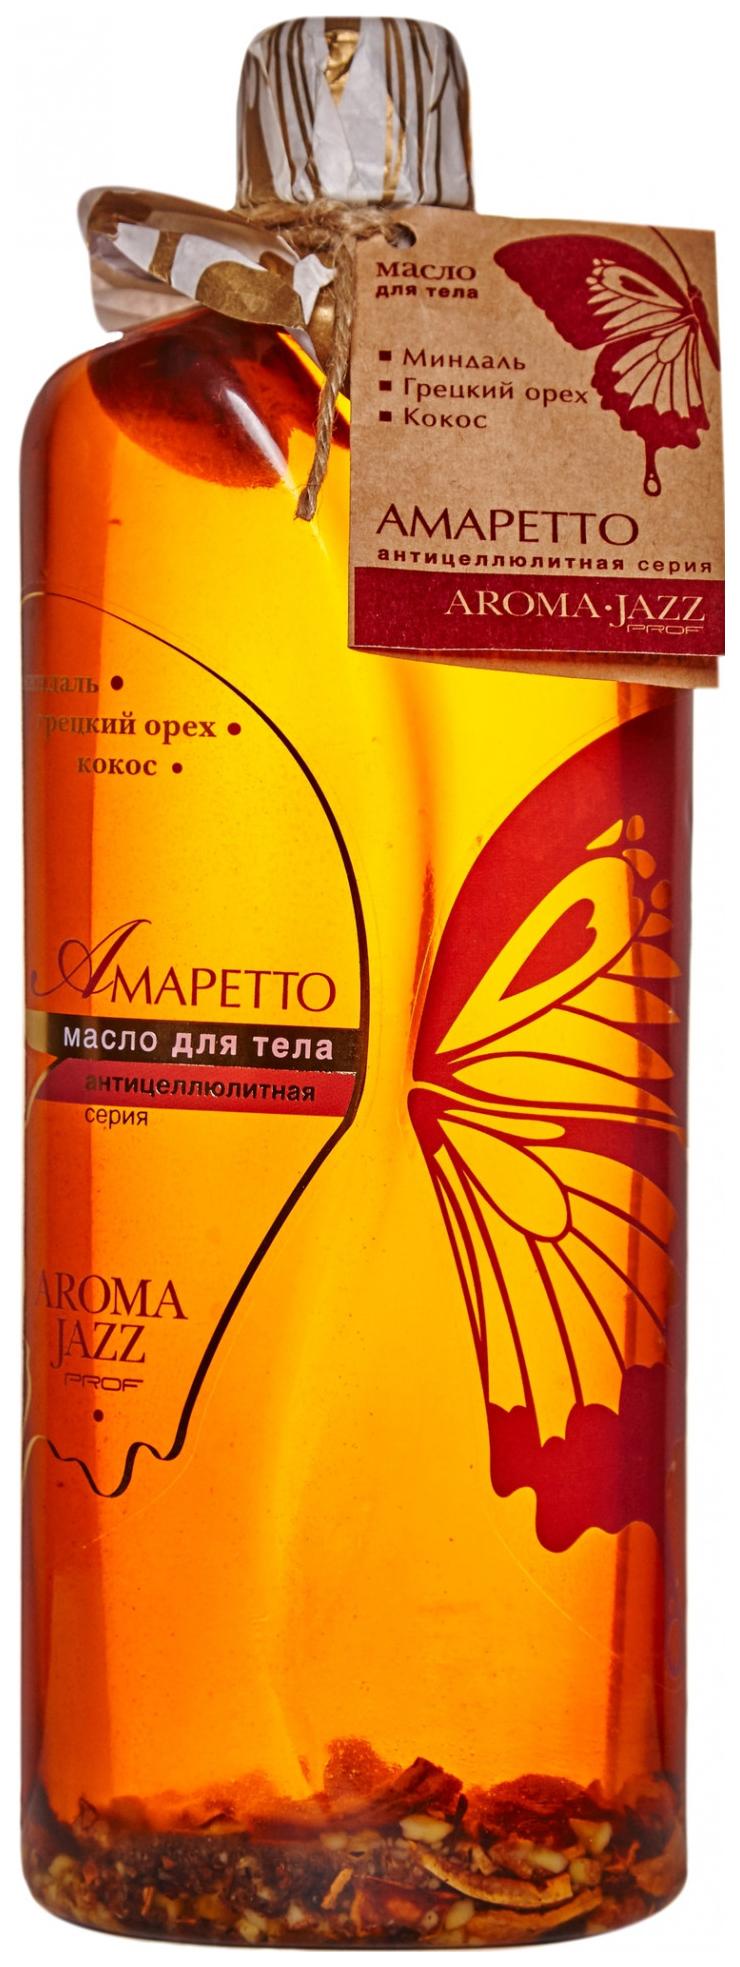 Купить Масло для тела Aroma Jazz Амаретто 1000 мл